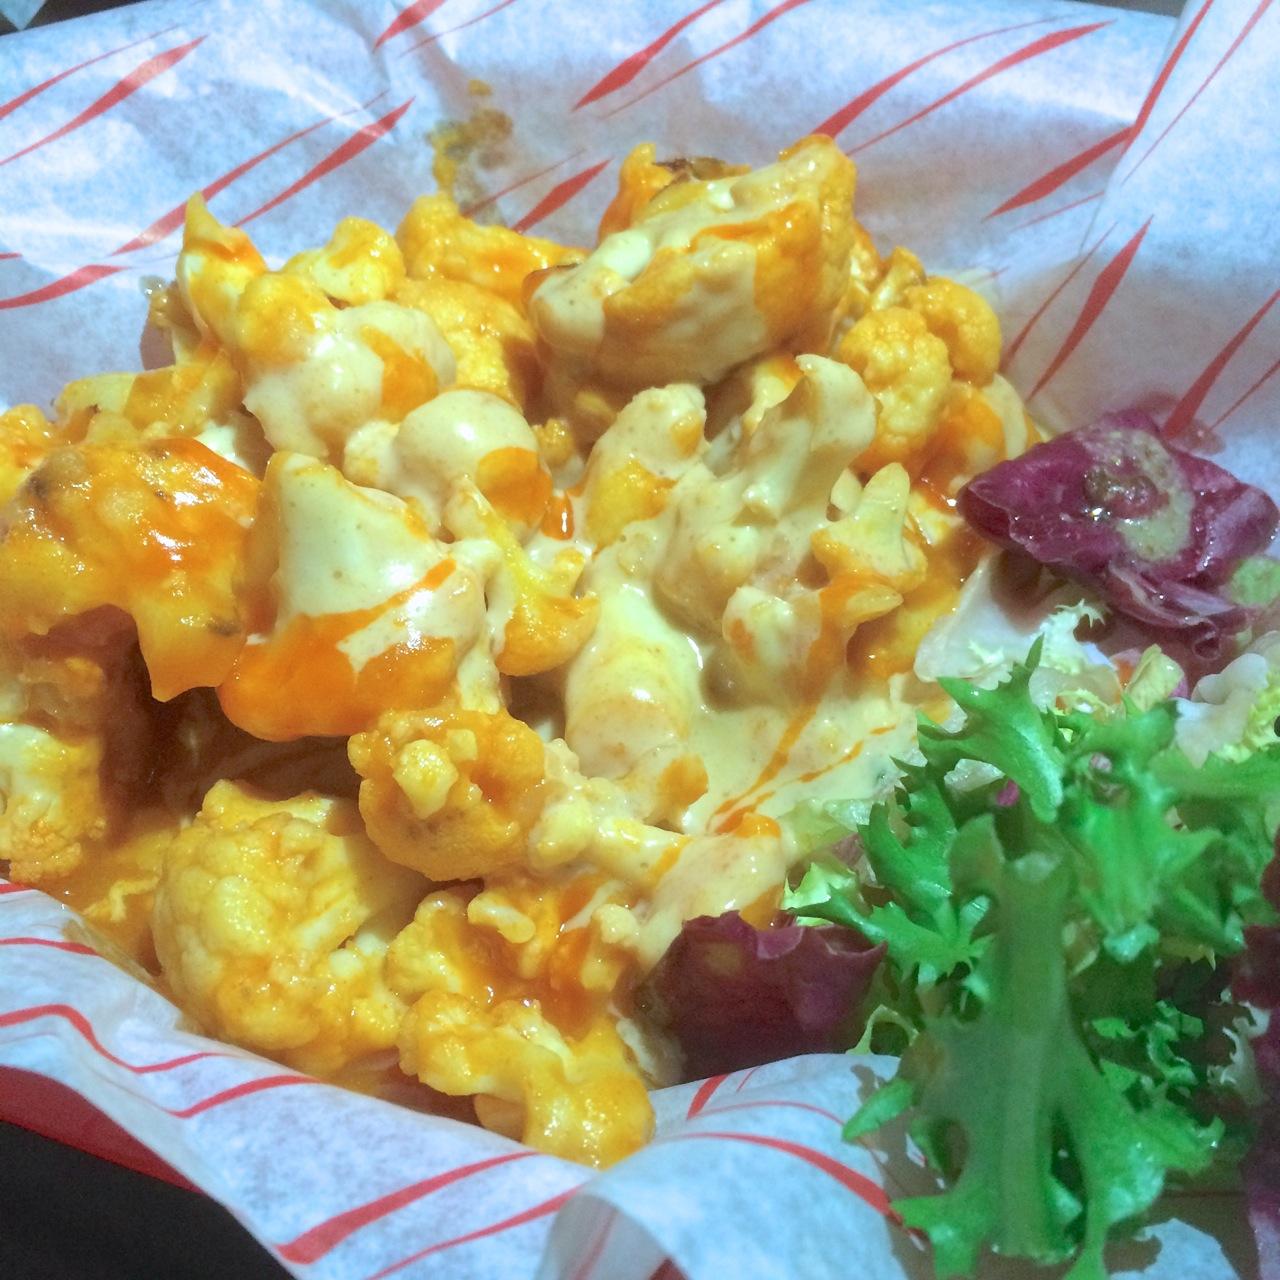 http://fatgayvegan.com/wp-content/uploads/2016/01/cauliflower.jpg